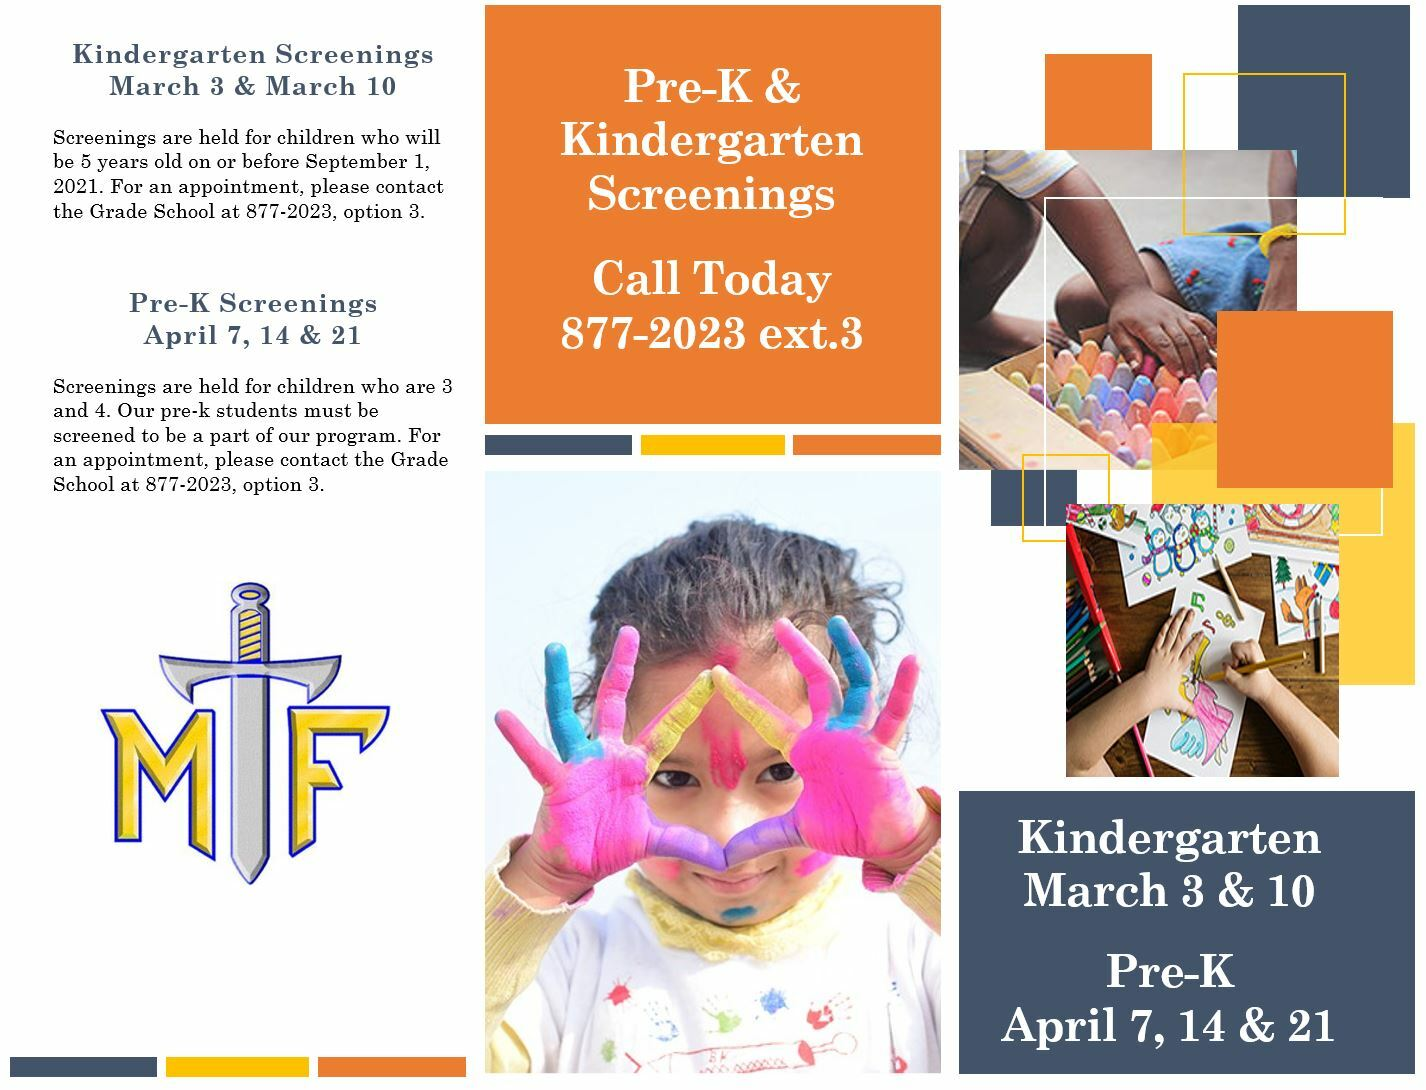 Pre-K & Kindergarten Screenings